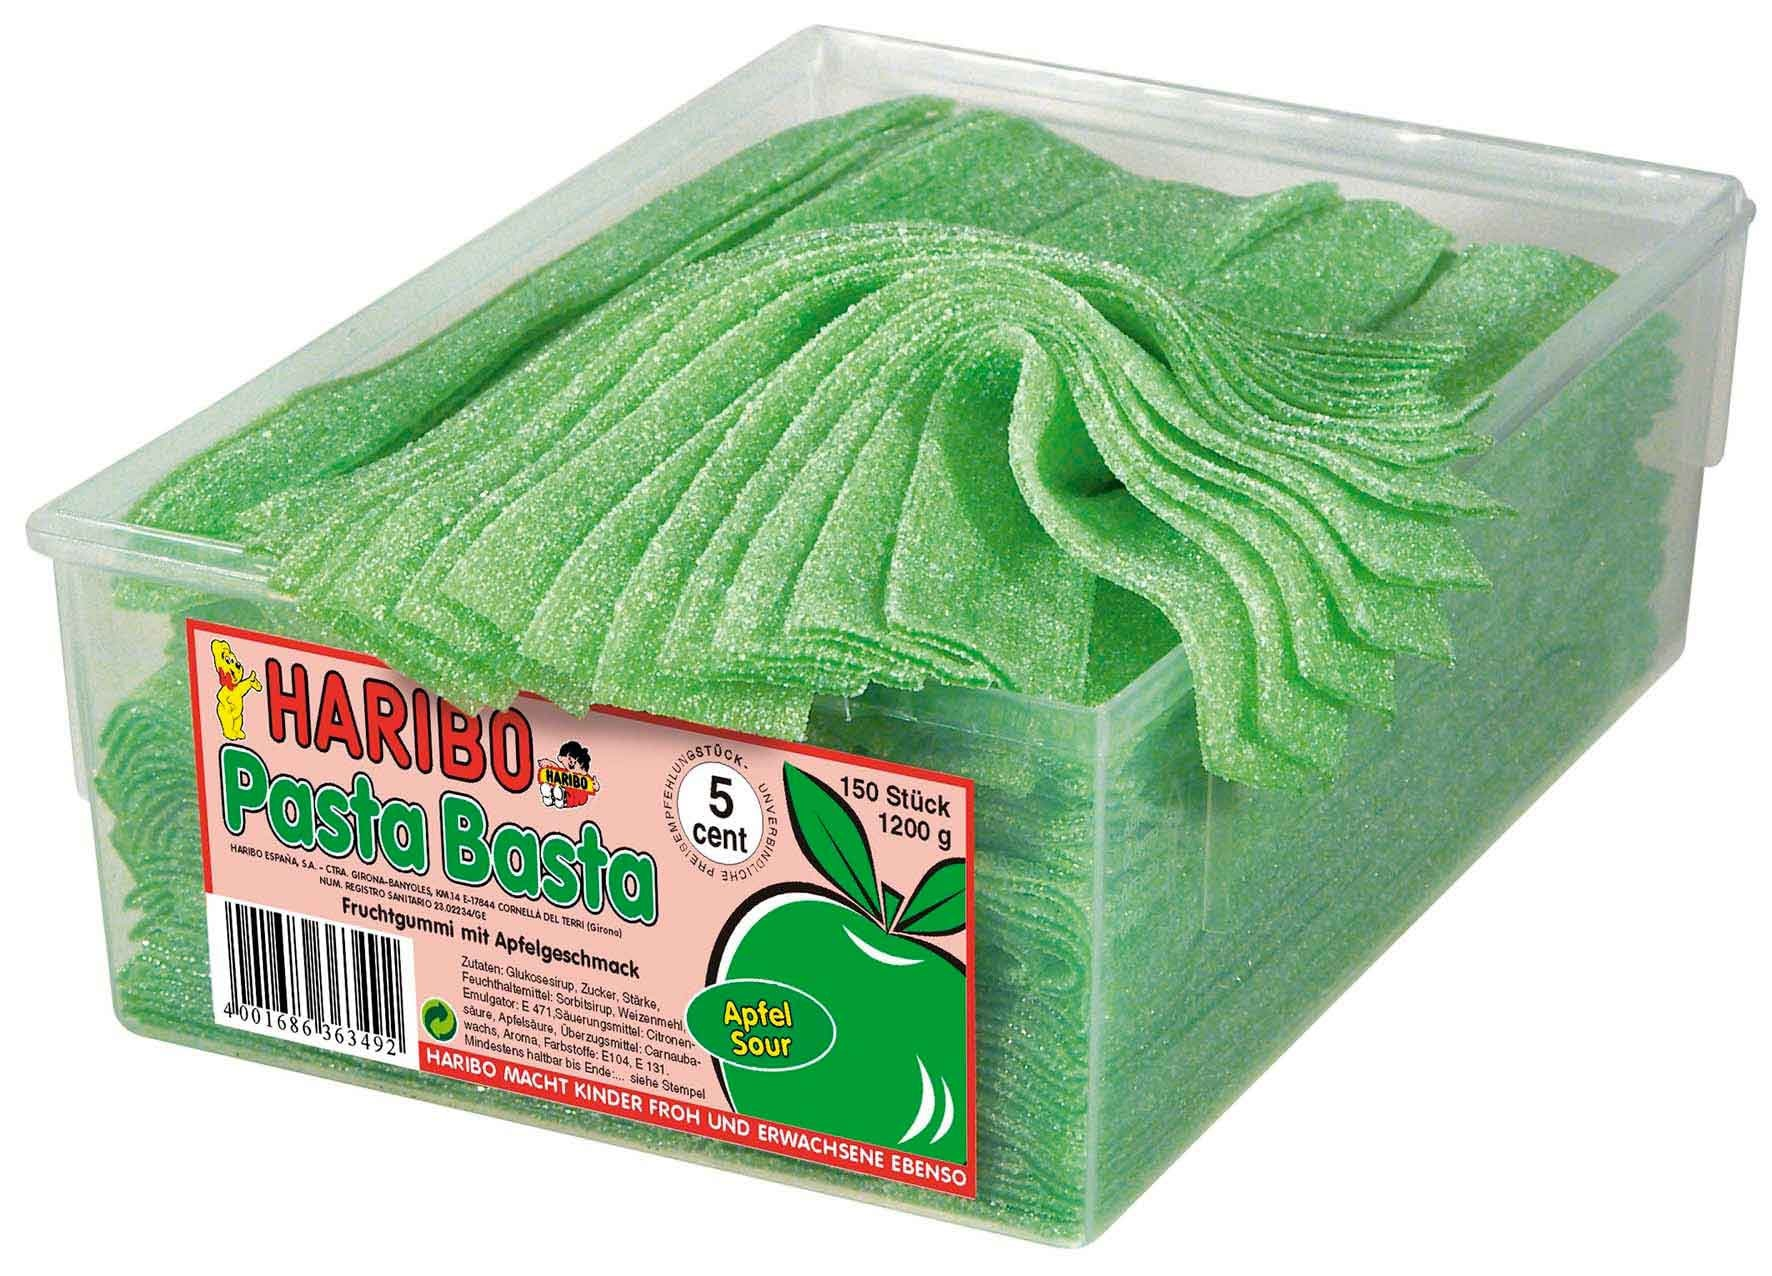 Haribo | Pasta Basta | Appel | 150 stuks